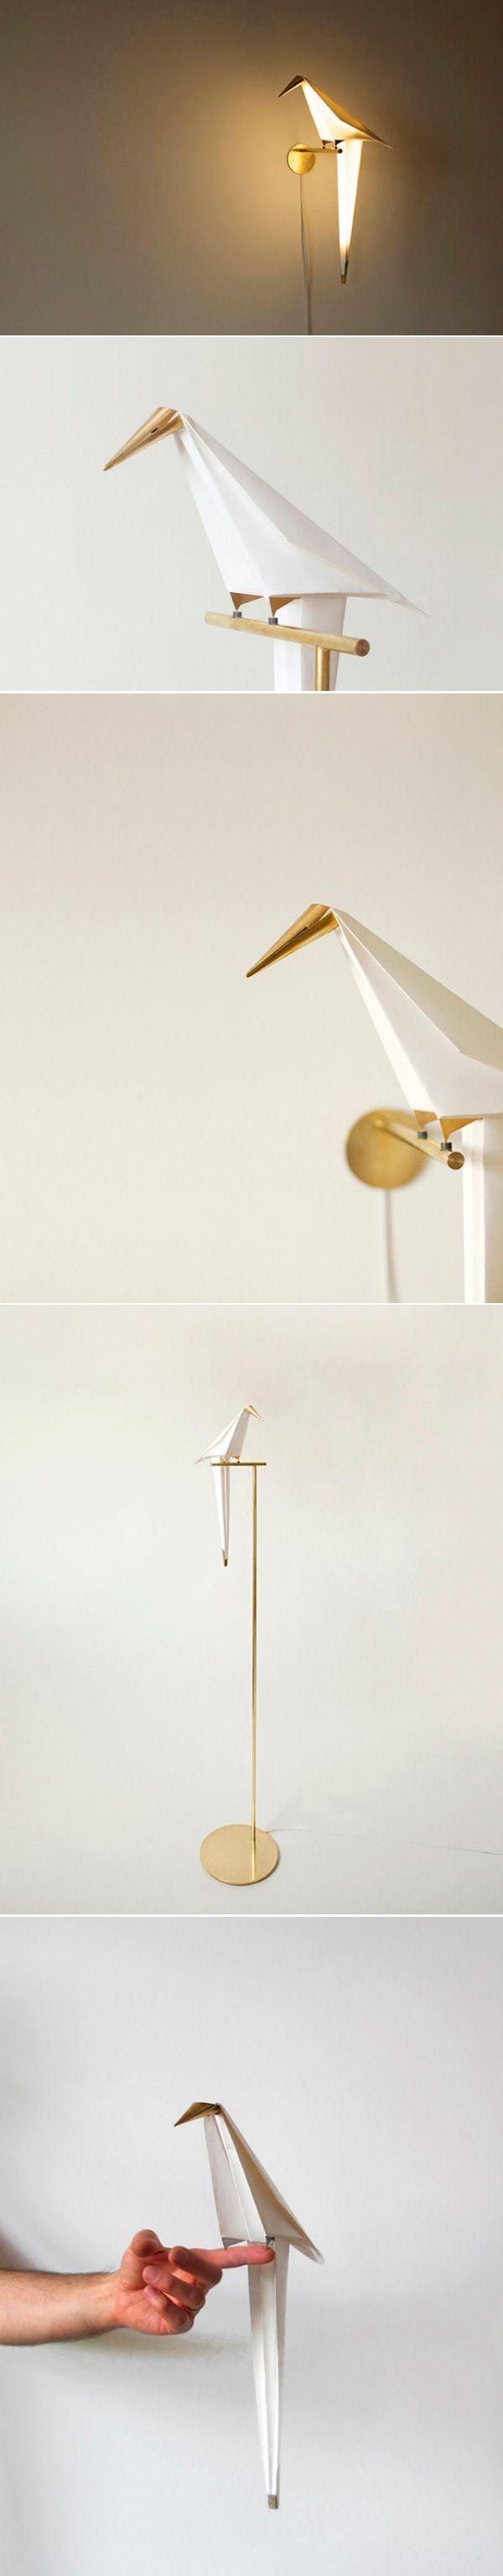 Interior design | decoration | home decor | furniture | Perched Bird Lamp by Umut Yamac